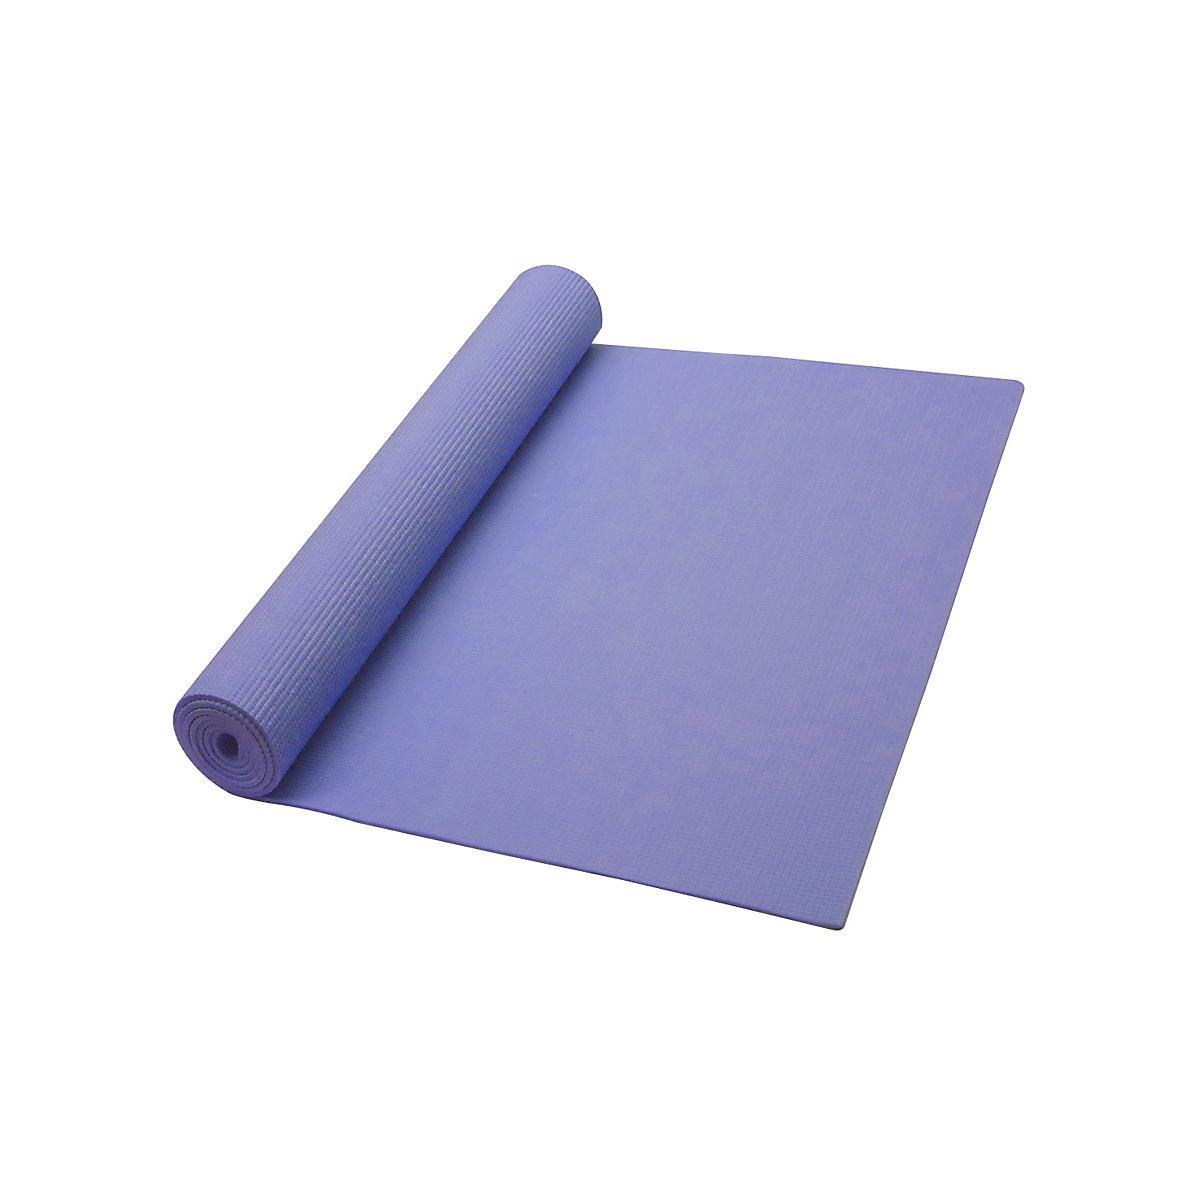 Trimax�PurAthletics Yoga Sticky Mats